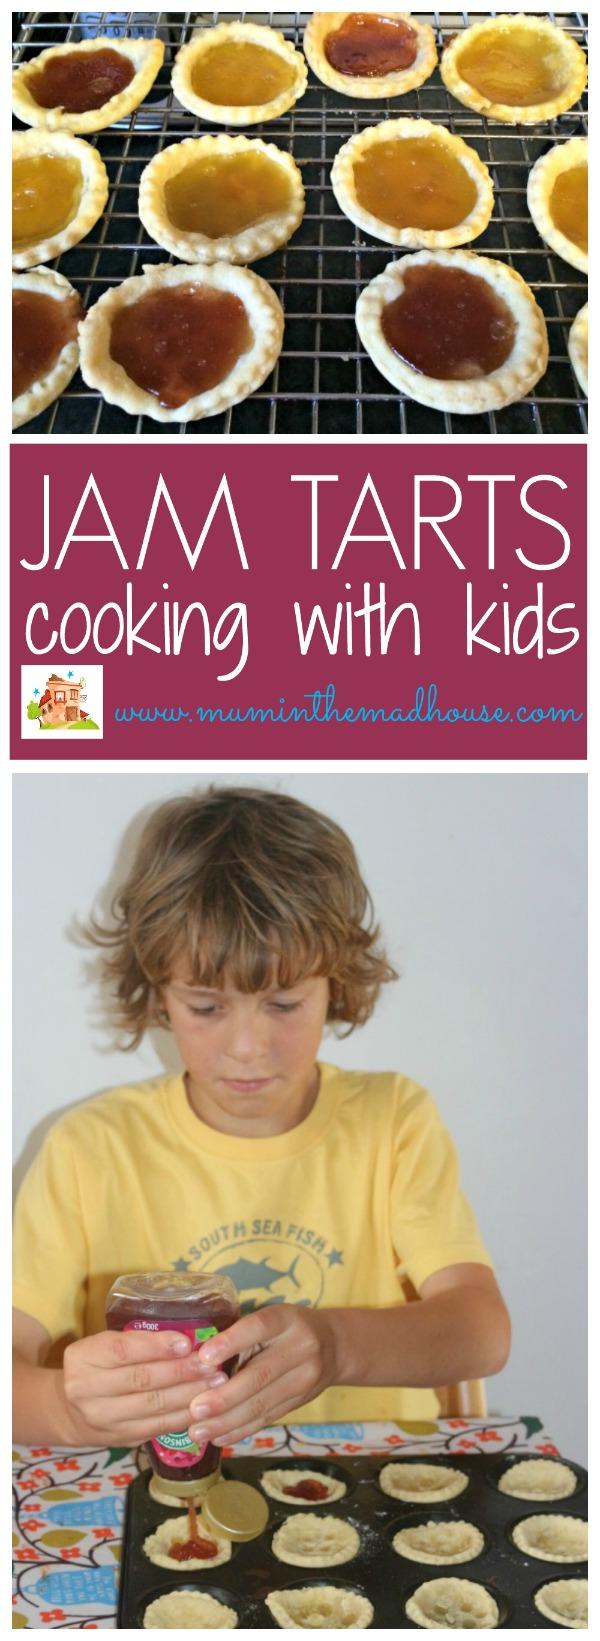 cooking with kids jam tarts